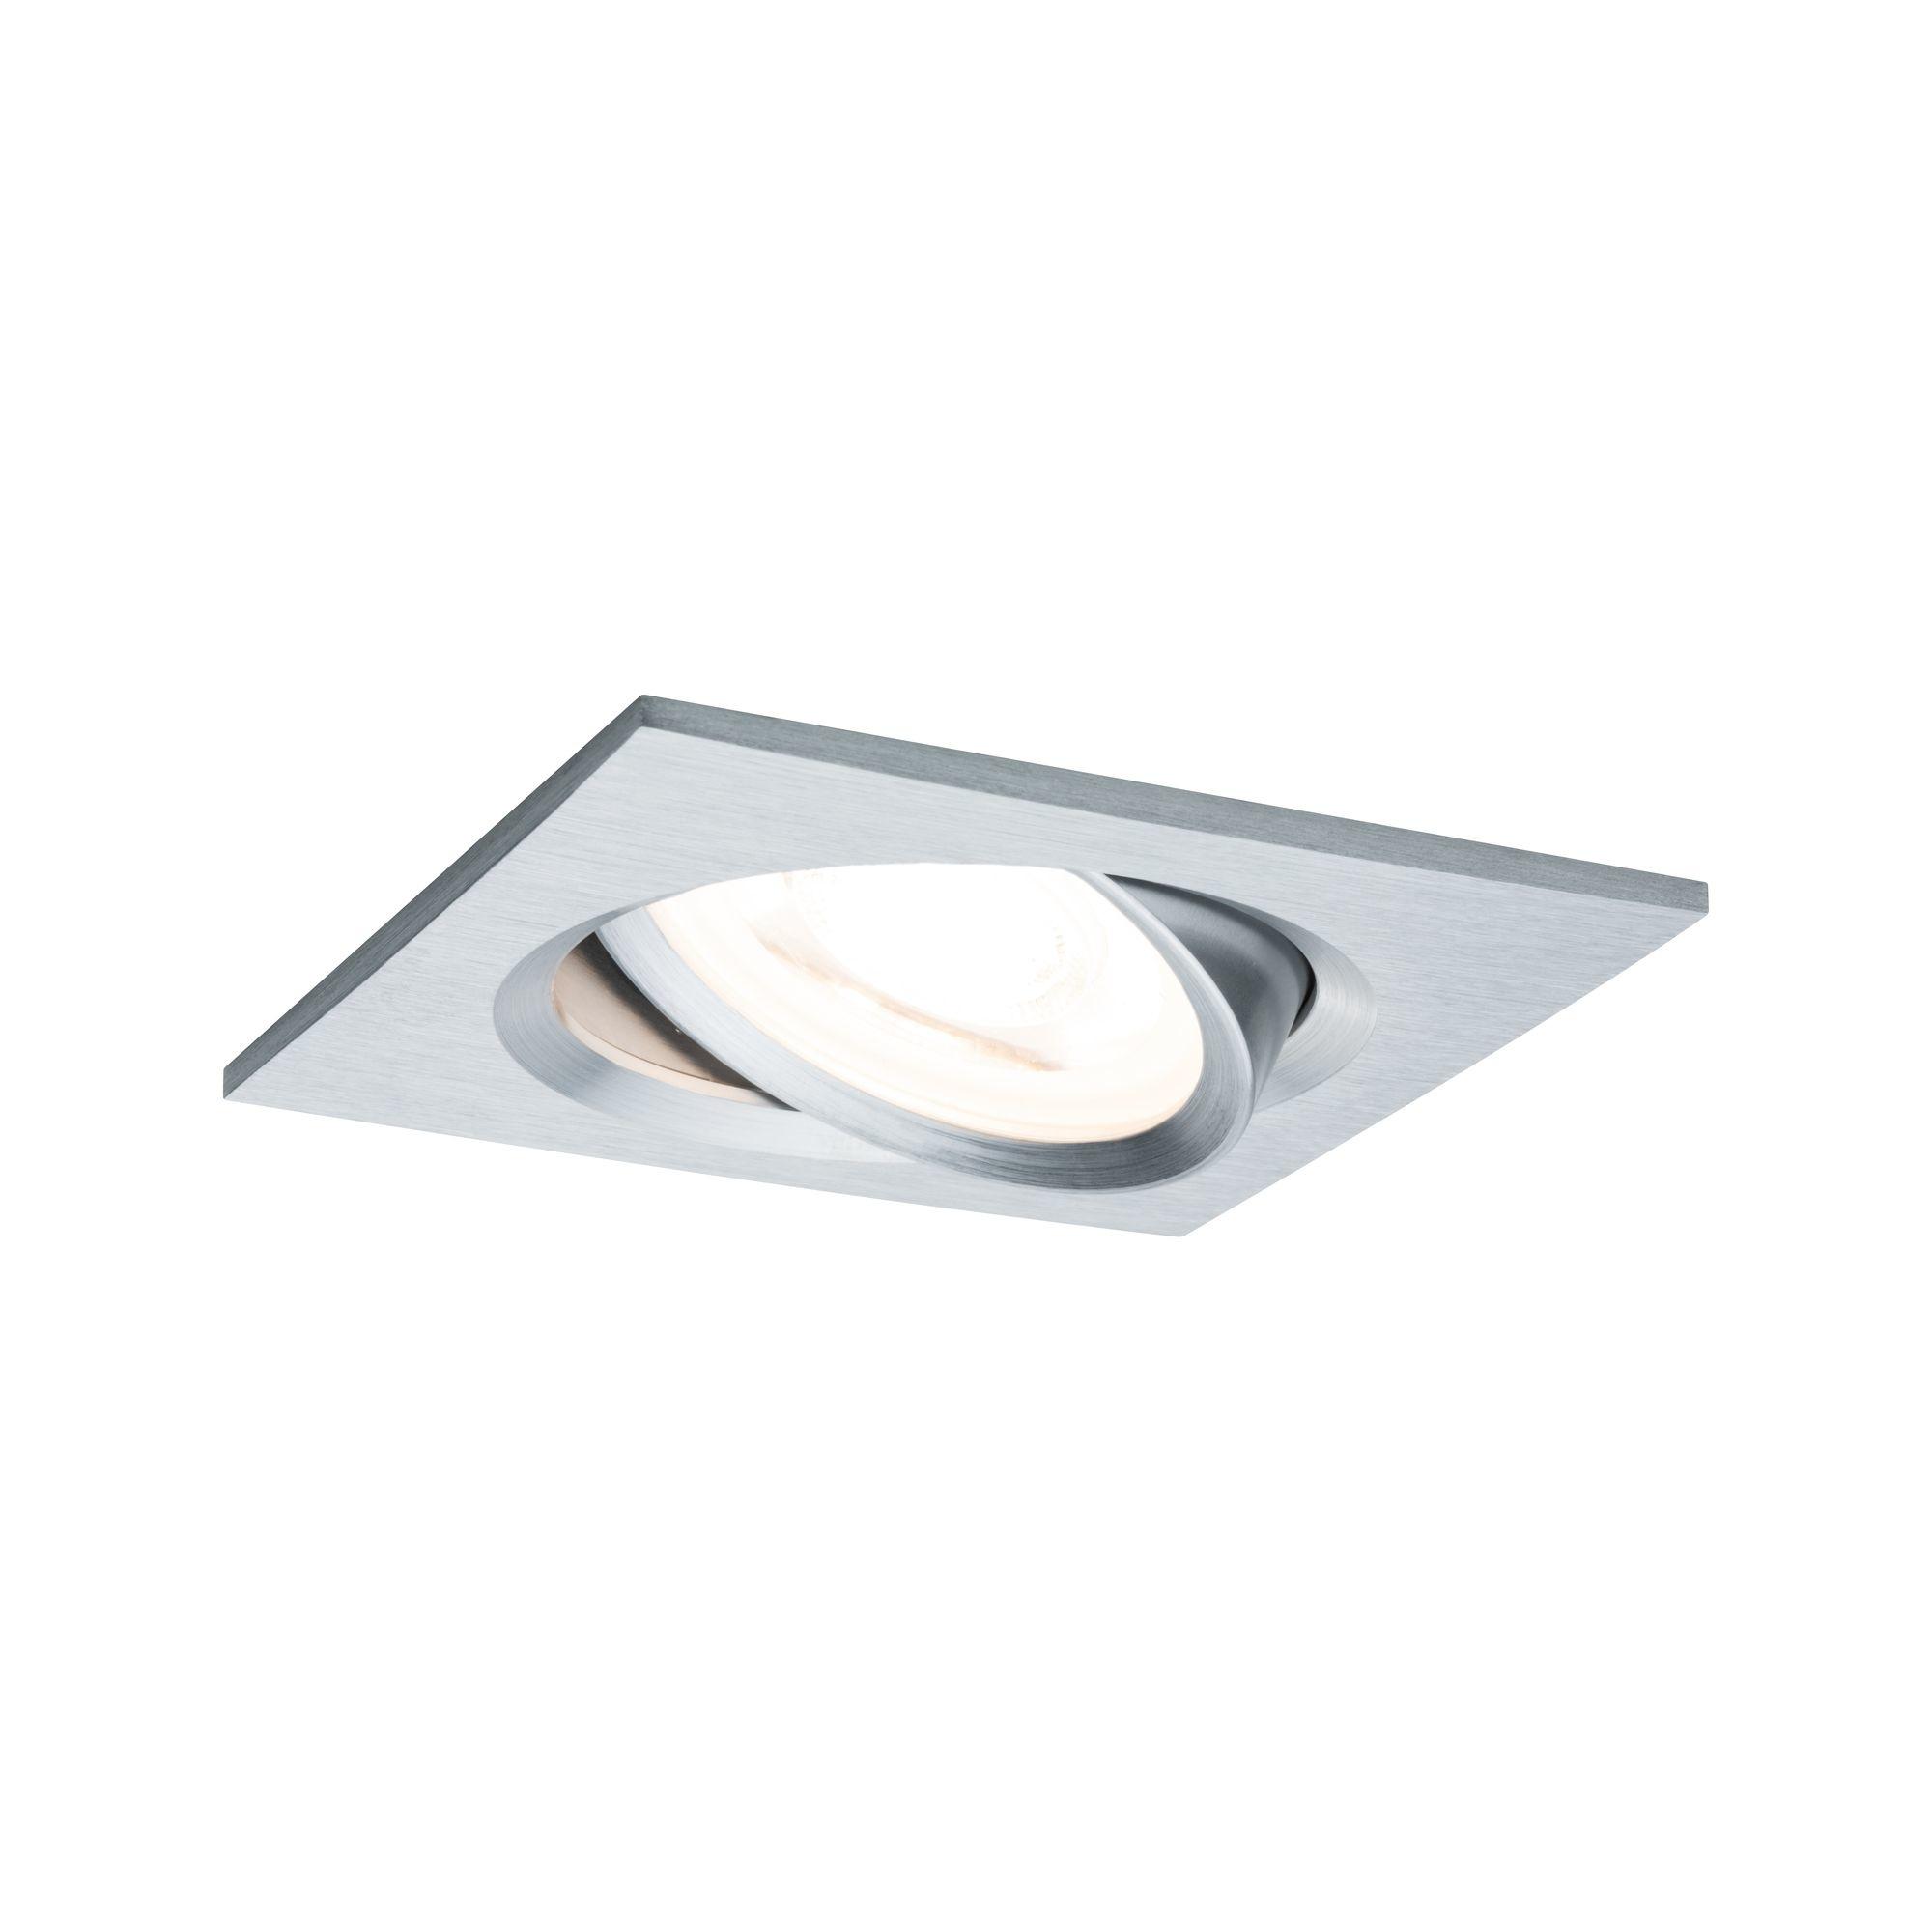 Paulmann EBL Set Nova eckig schwenkbar LED 1x6,5W2700K 230V GU10 51mm Alu ged/Alu